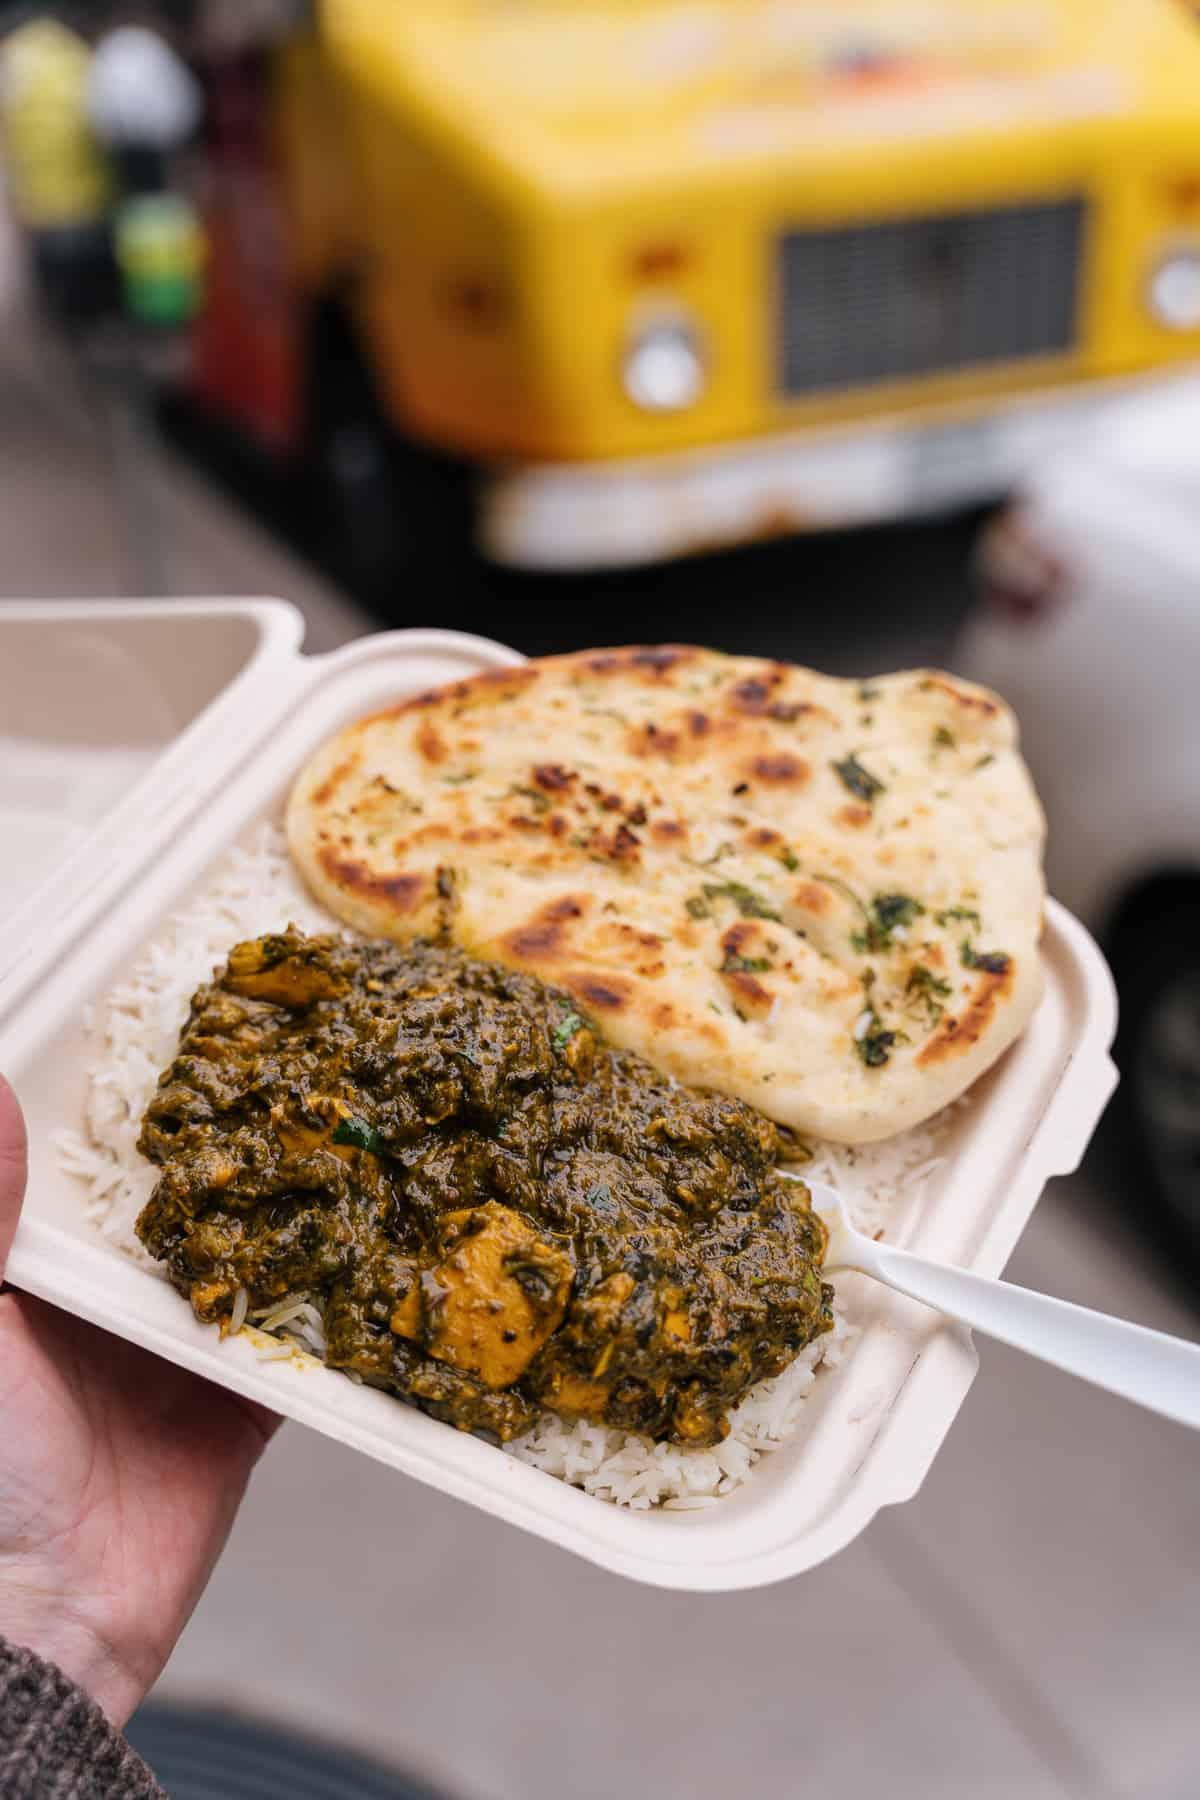 Saag Paneer and Garlic Naan from Taj Palace Food Truck